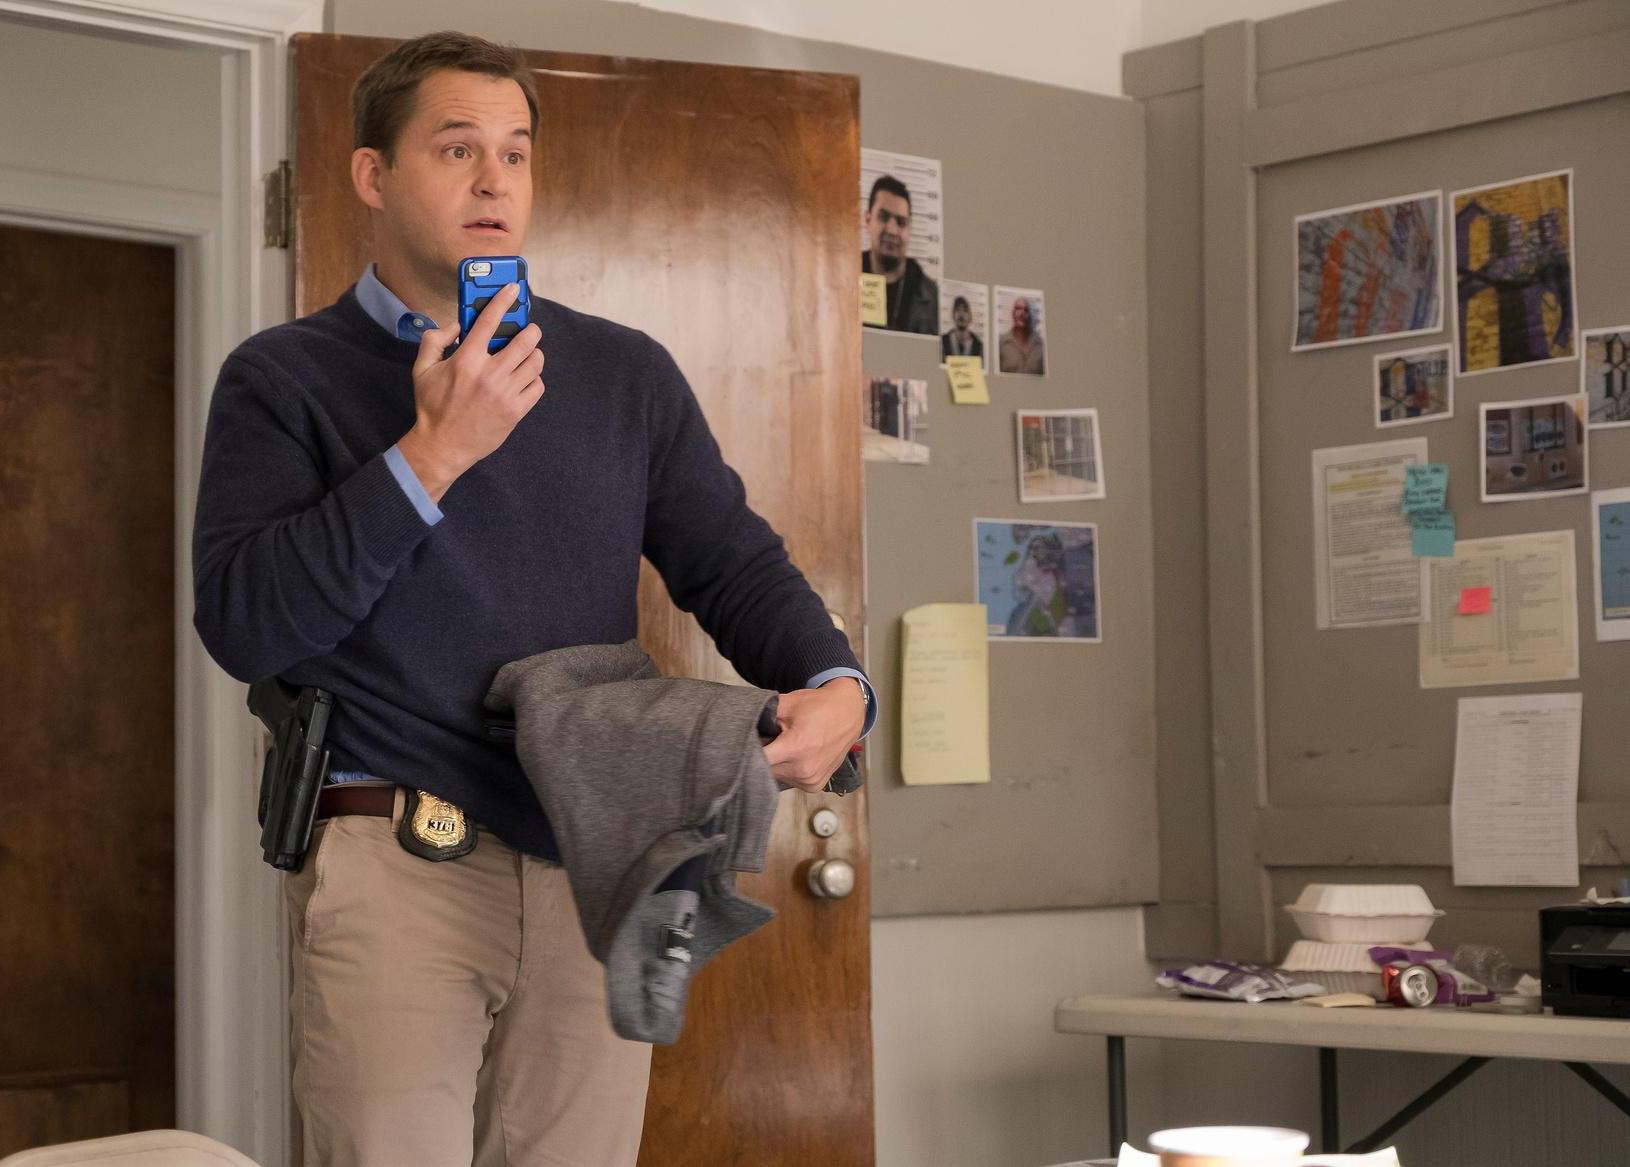 Brooklyn Nine-Nine: The Audit | Season 4 | Episode 13